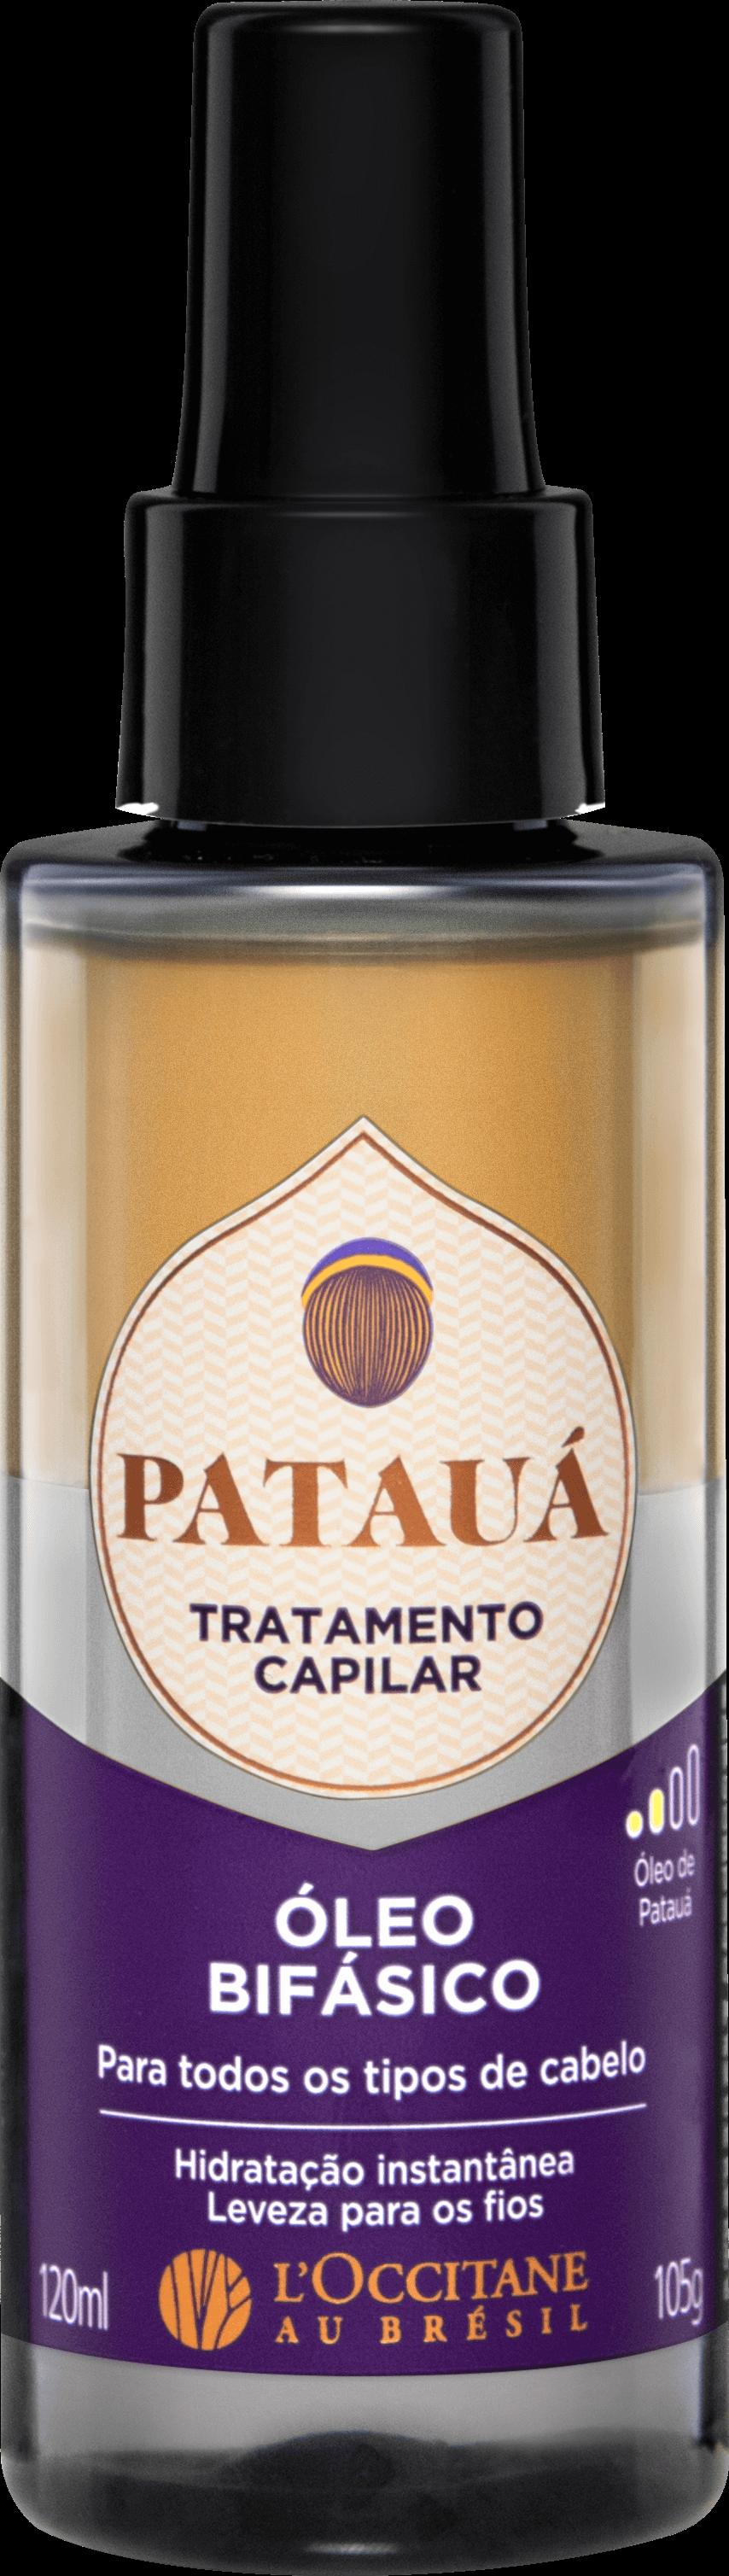 Óleo Bifásico Tratamento Capilar Patauá, L'Occitane au Brésil - 120 ml